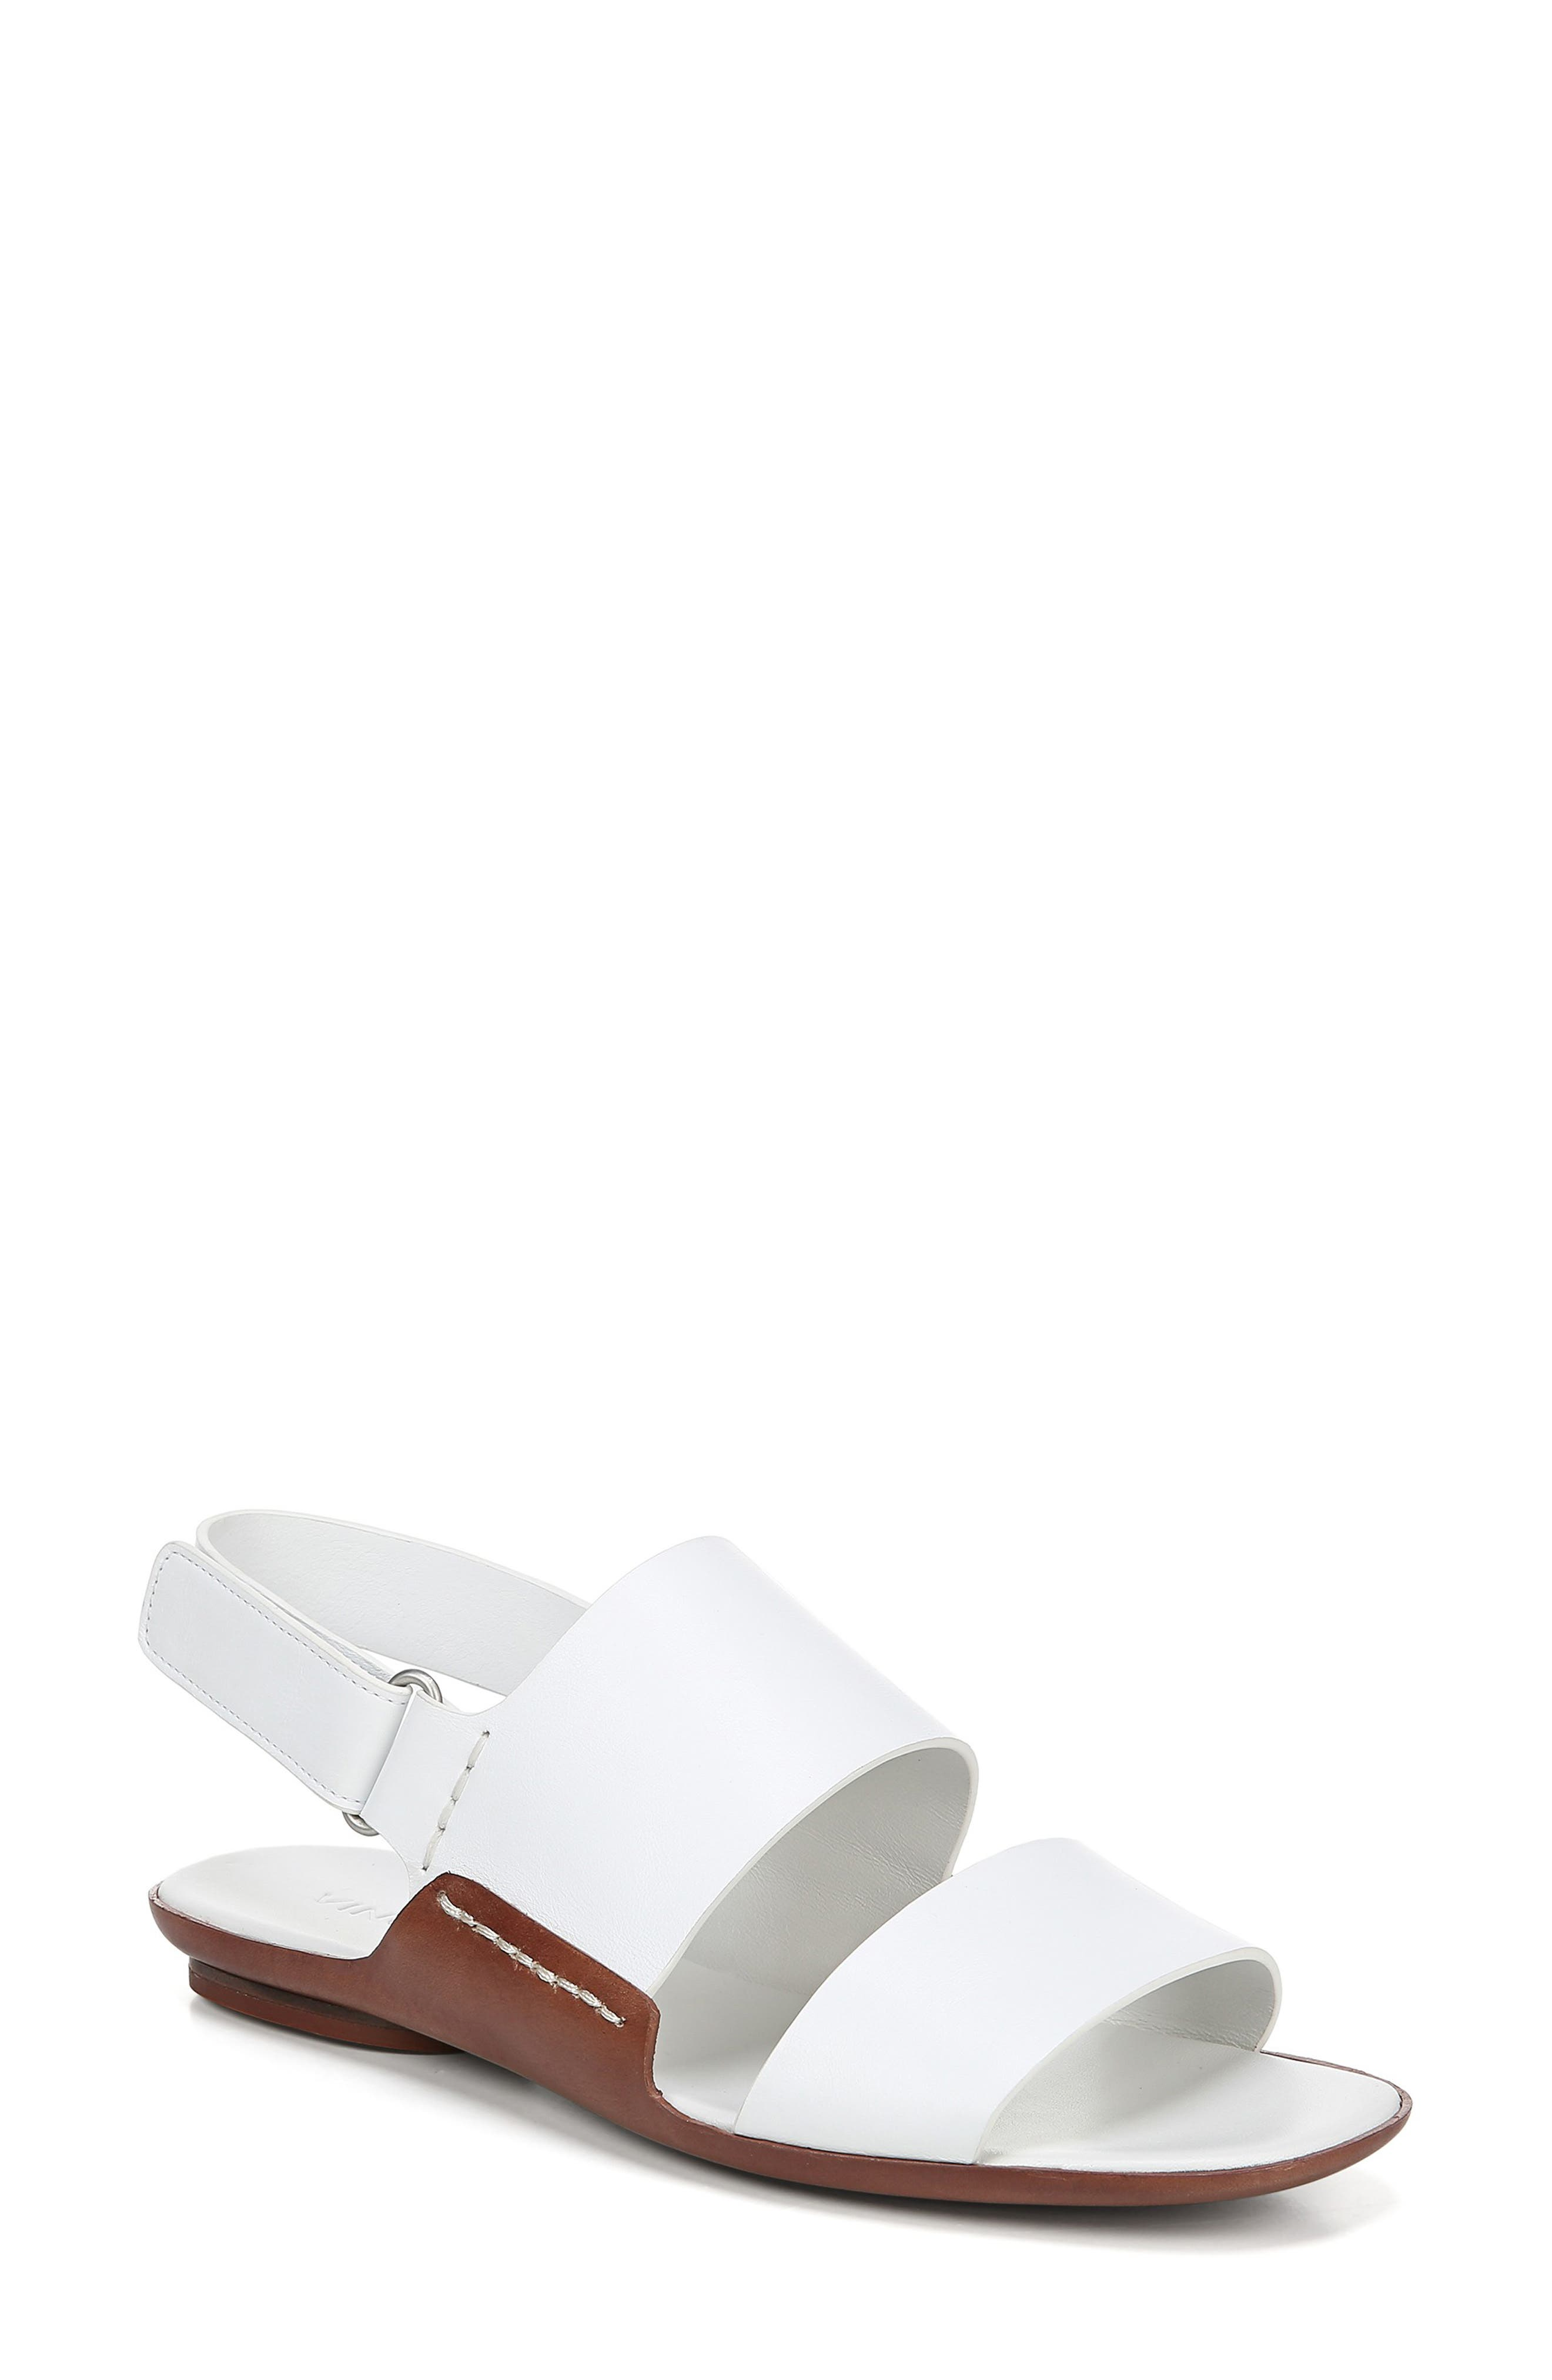 Telsa Flat Leather Slingback Sandals in White